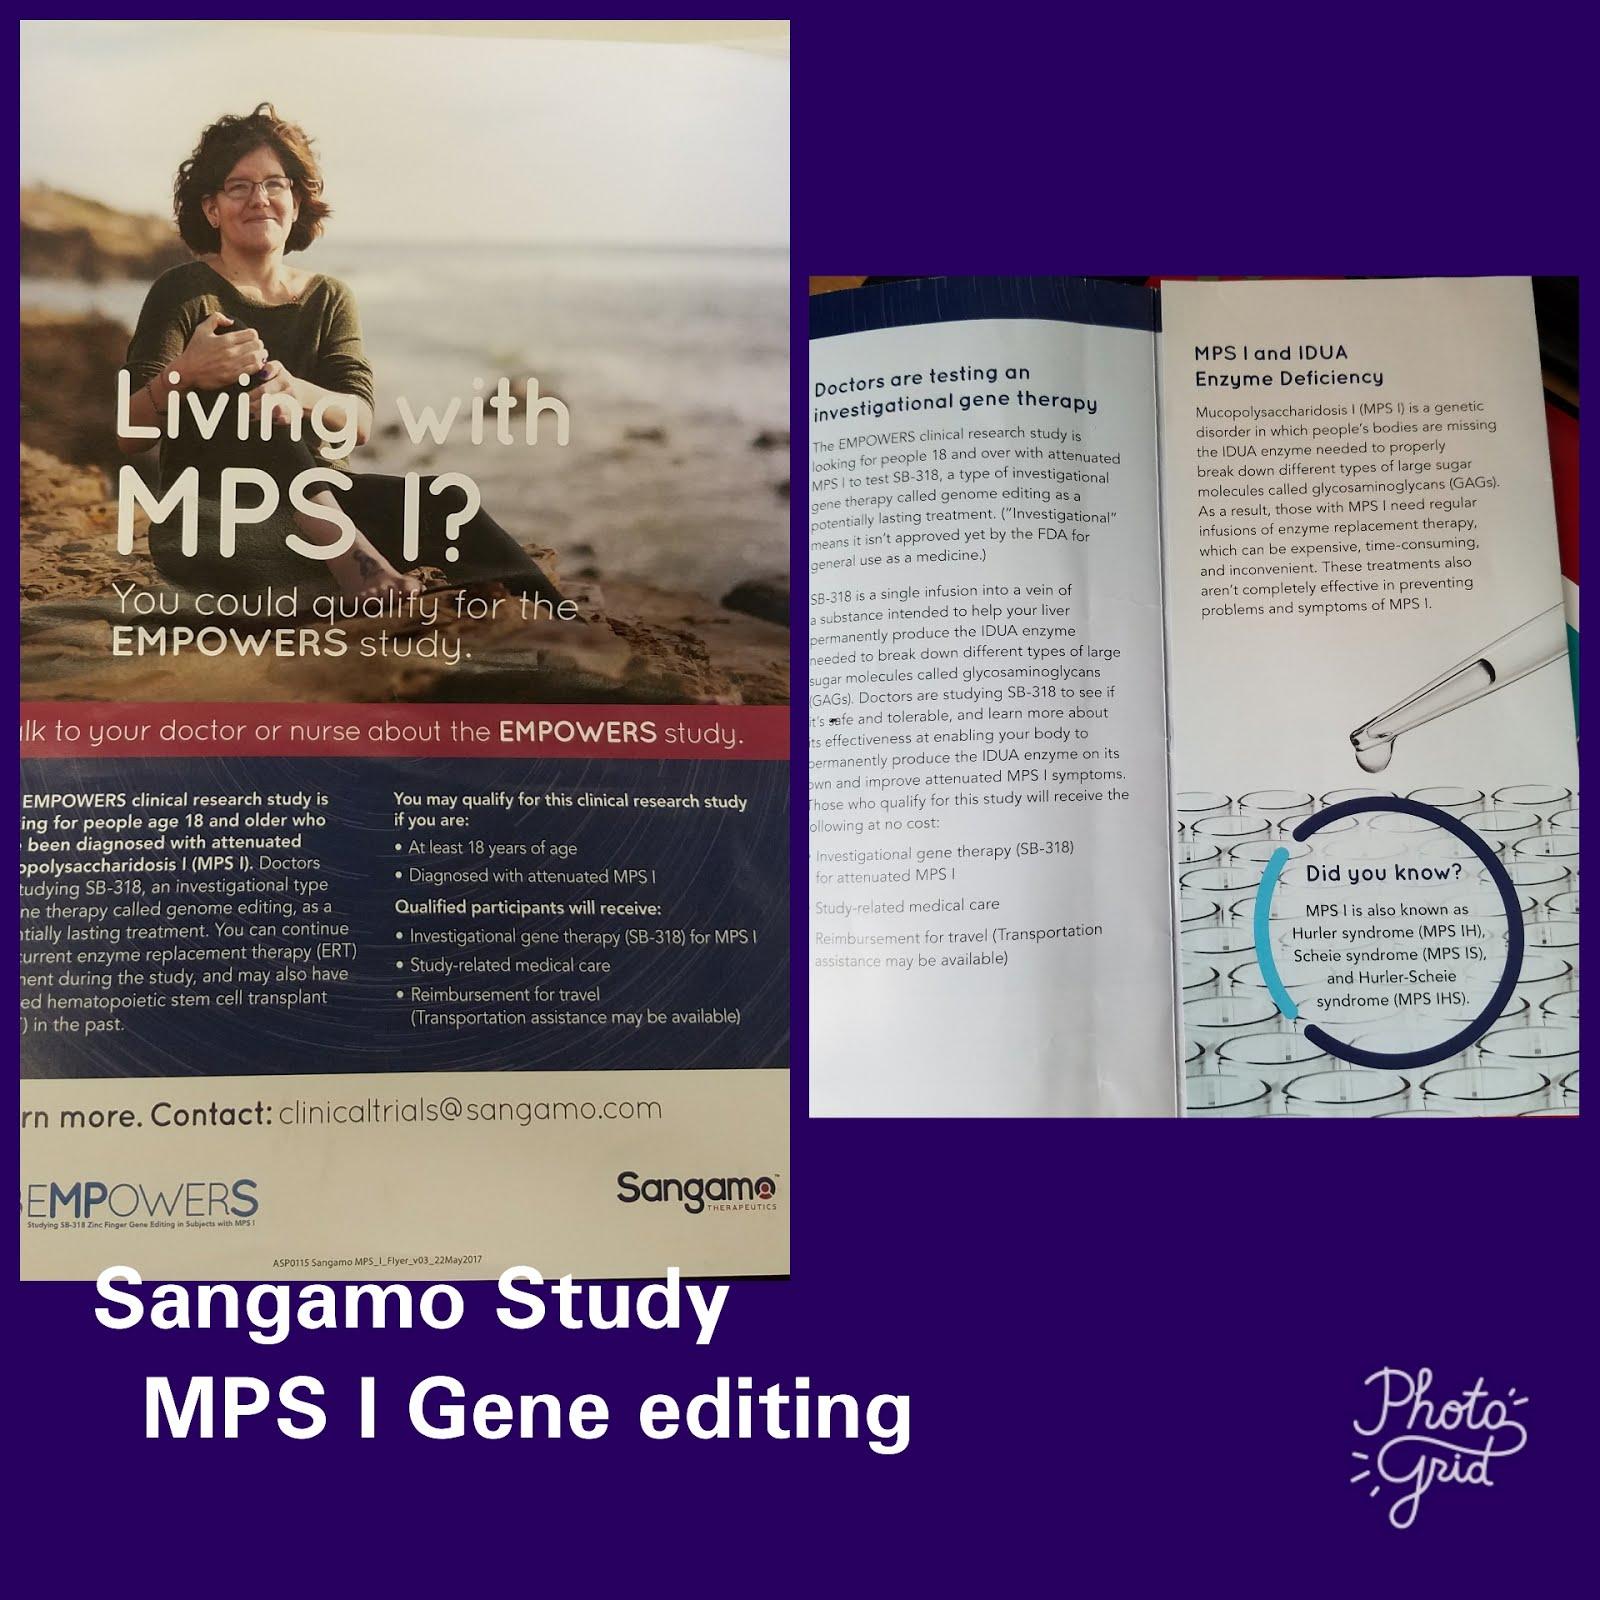 Sangamo, MPS I